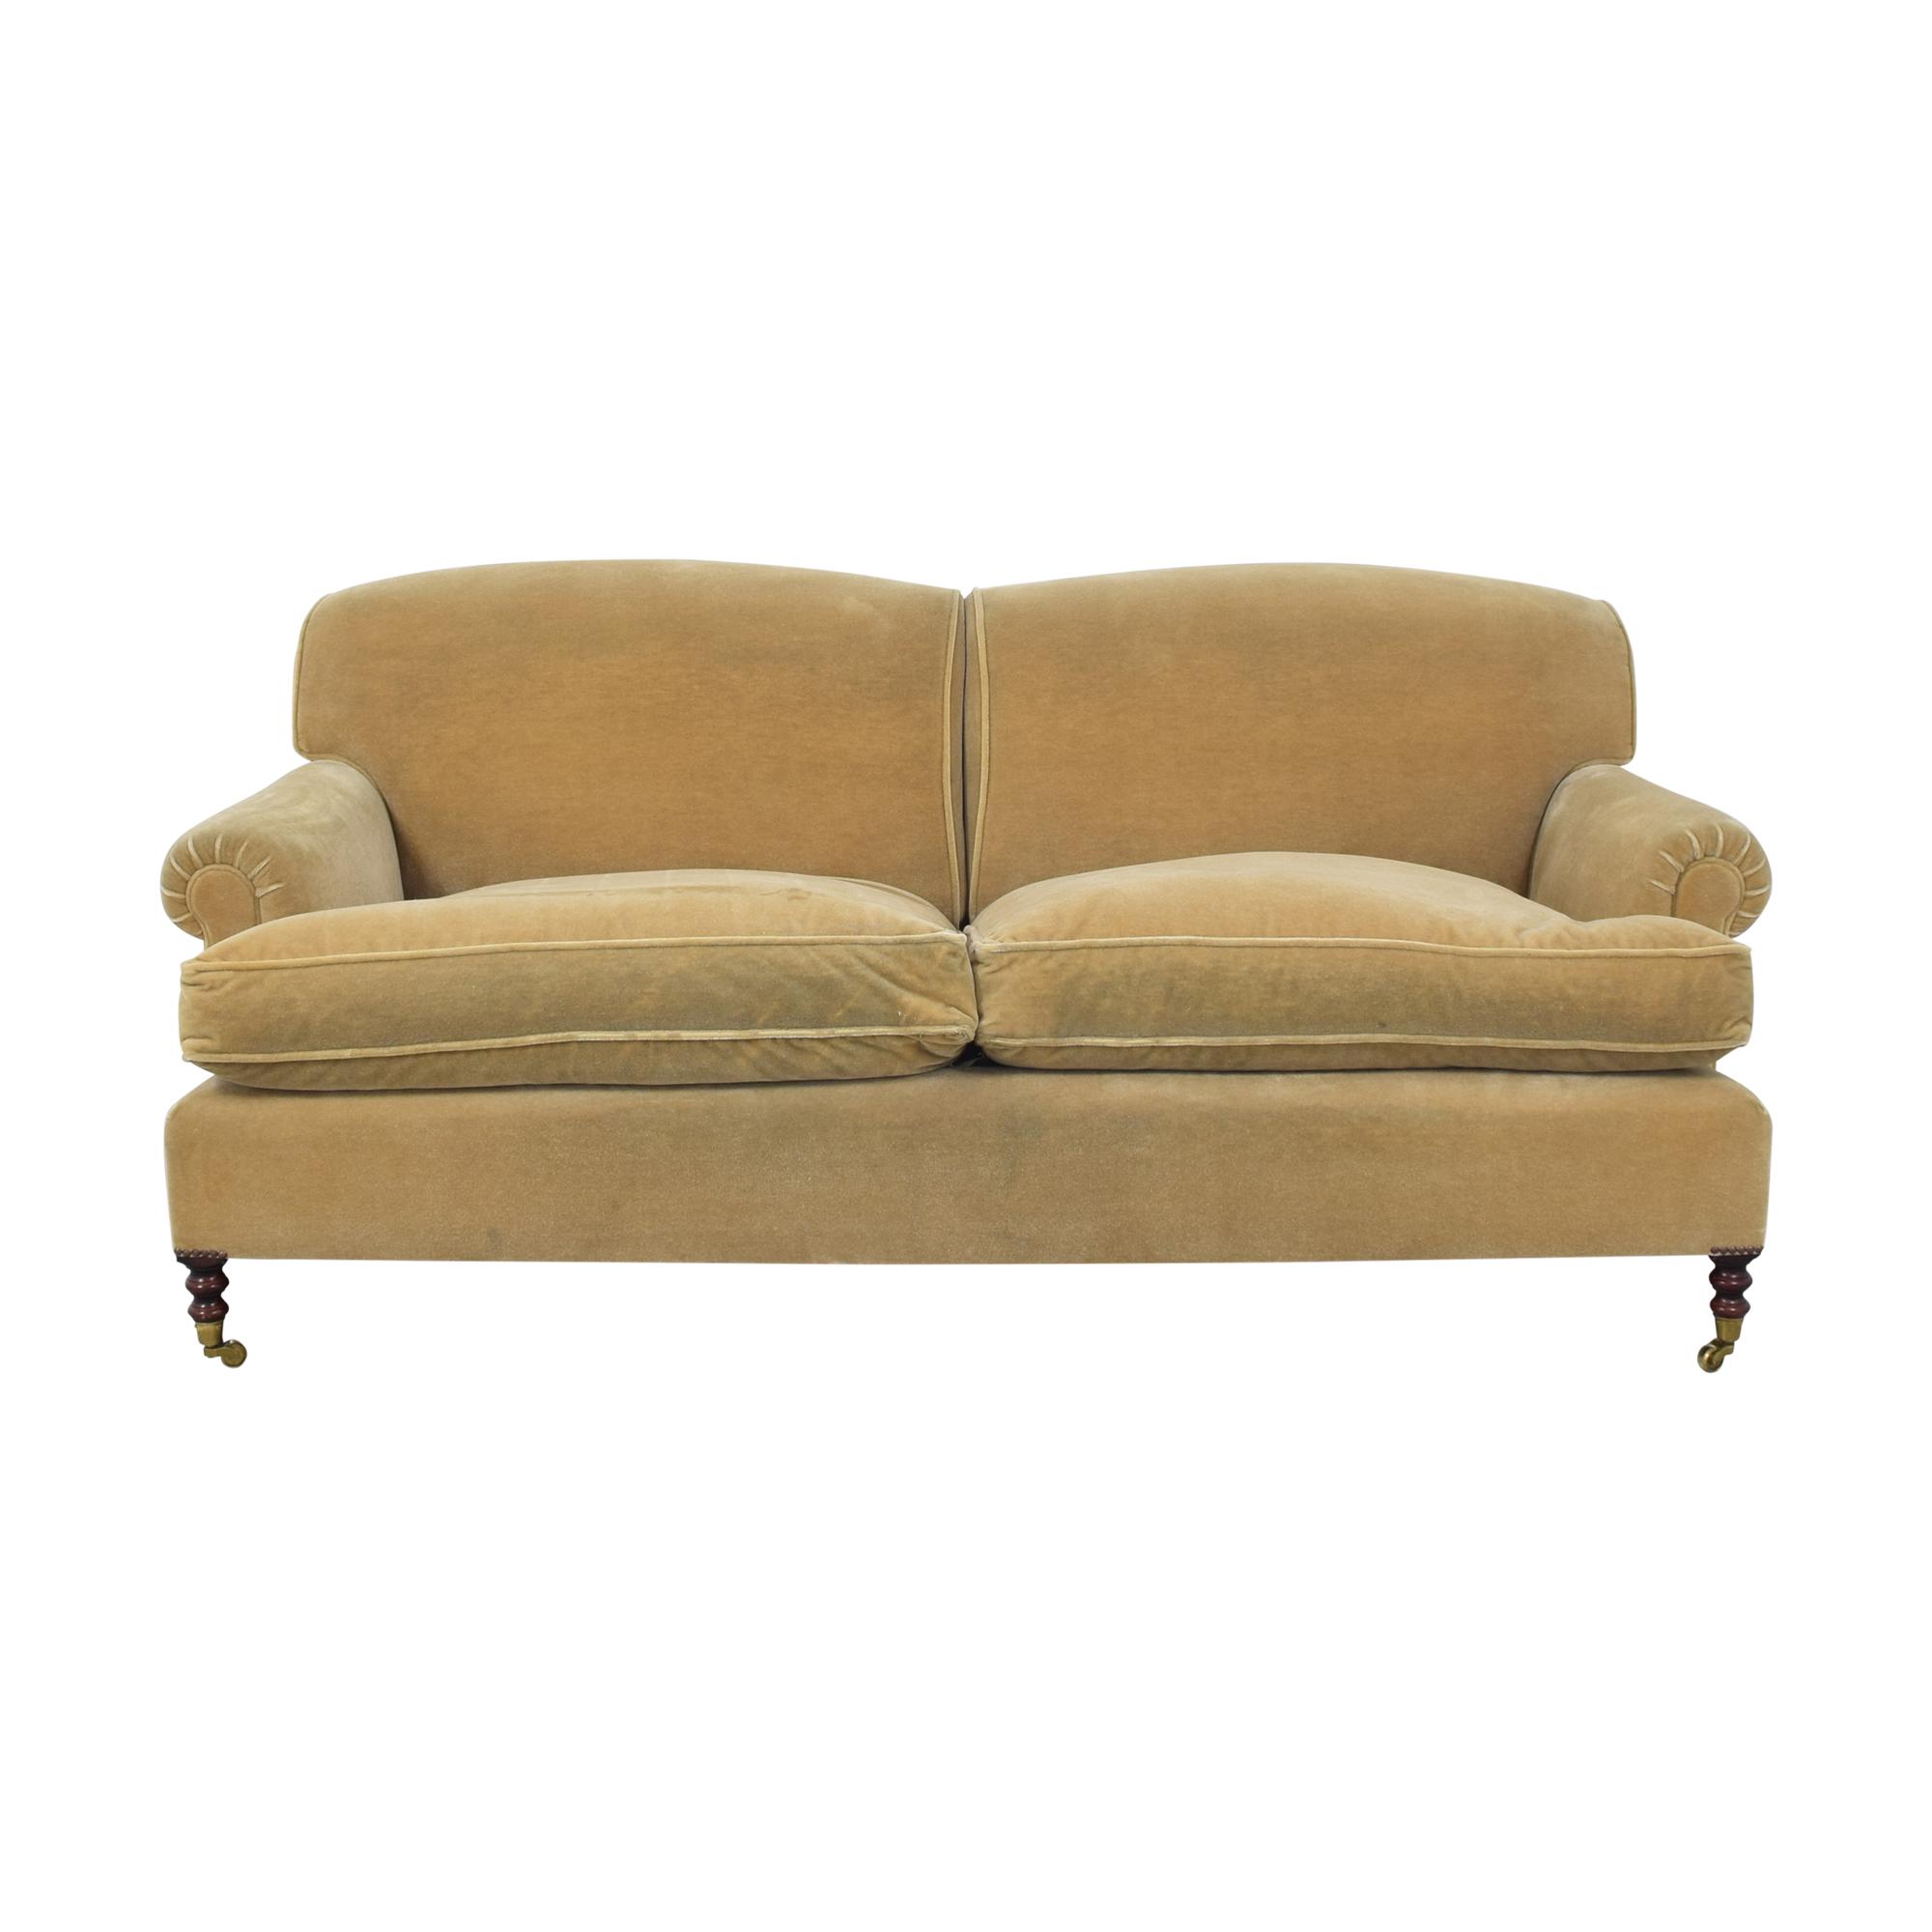 George Smith George Smith Scroll Arm Sofa tan